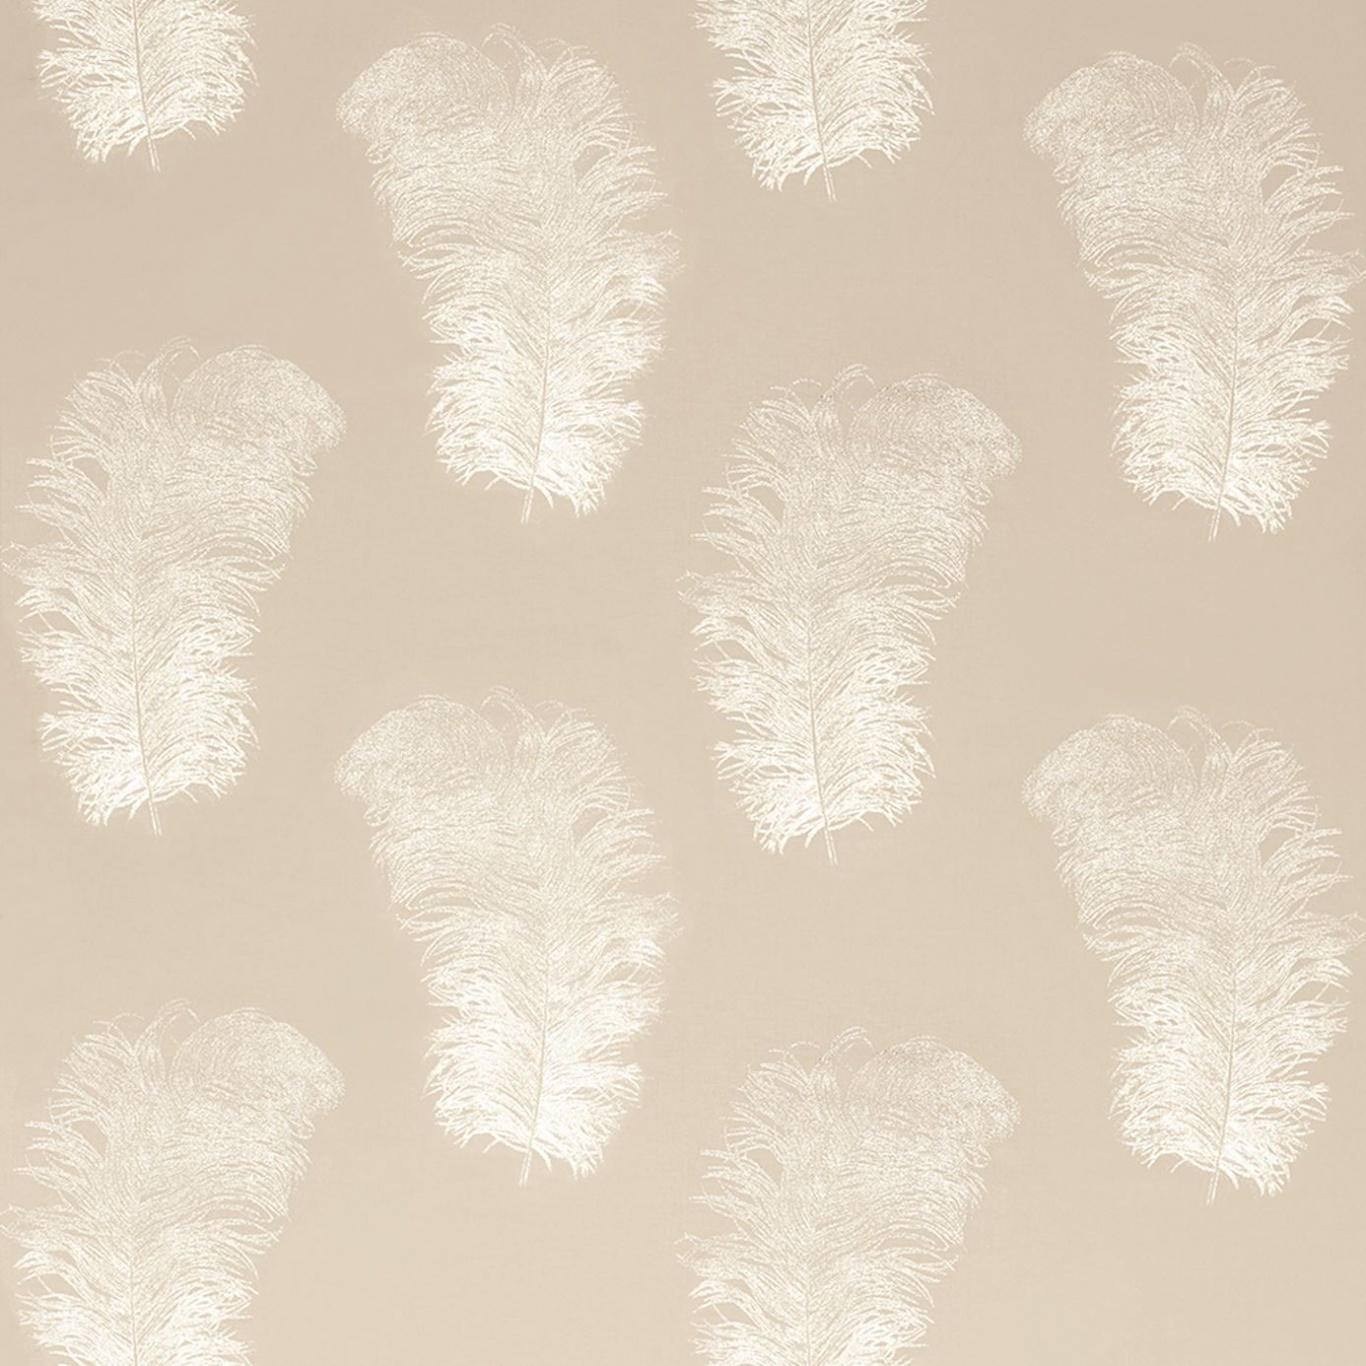 Image of Harlequin Operetta Pebble Curtain Fabric 120442